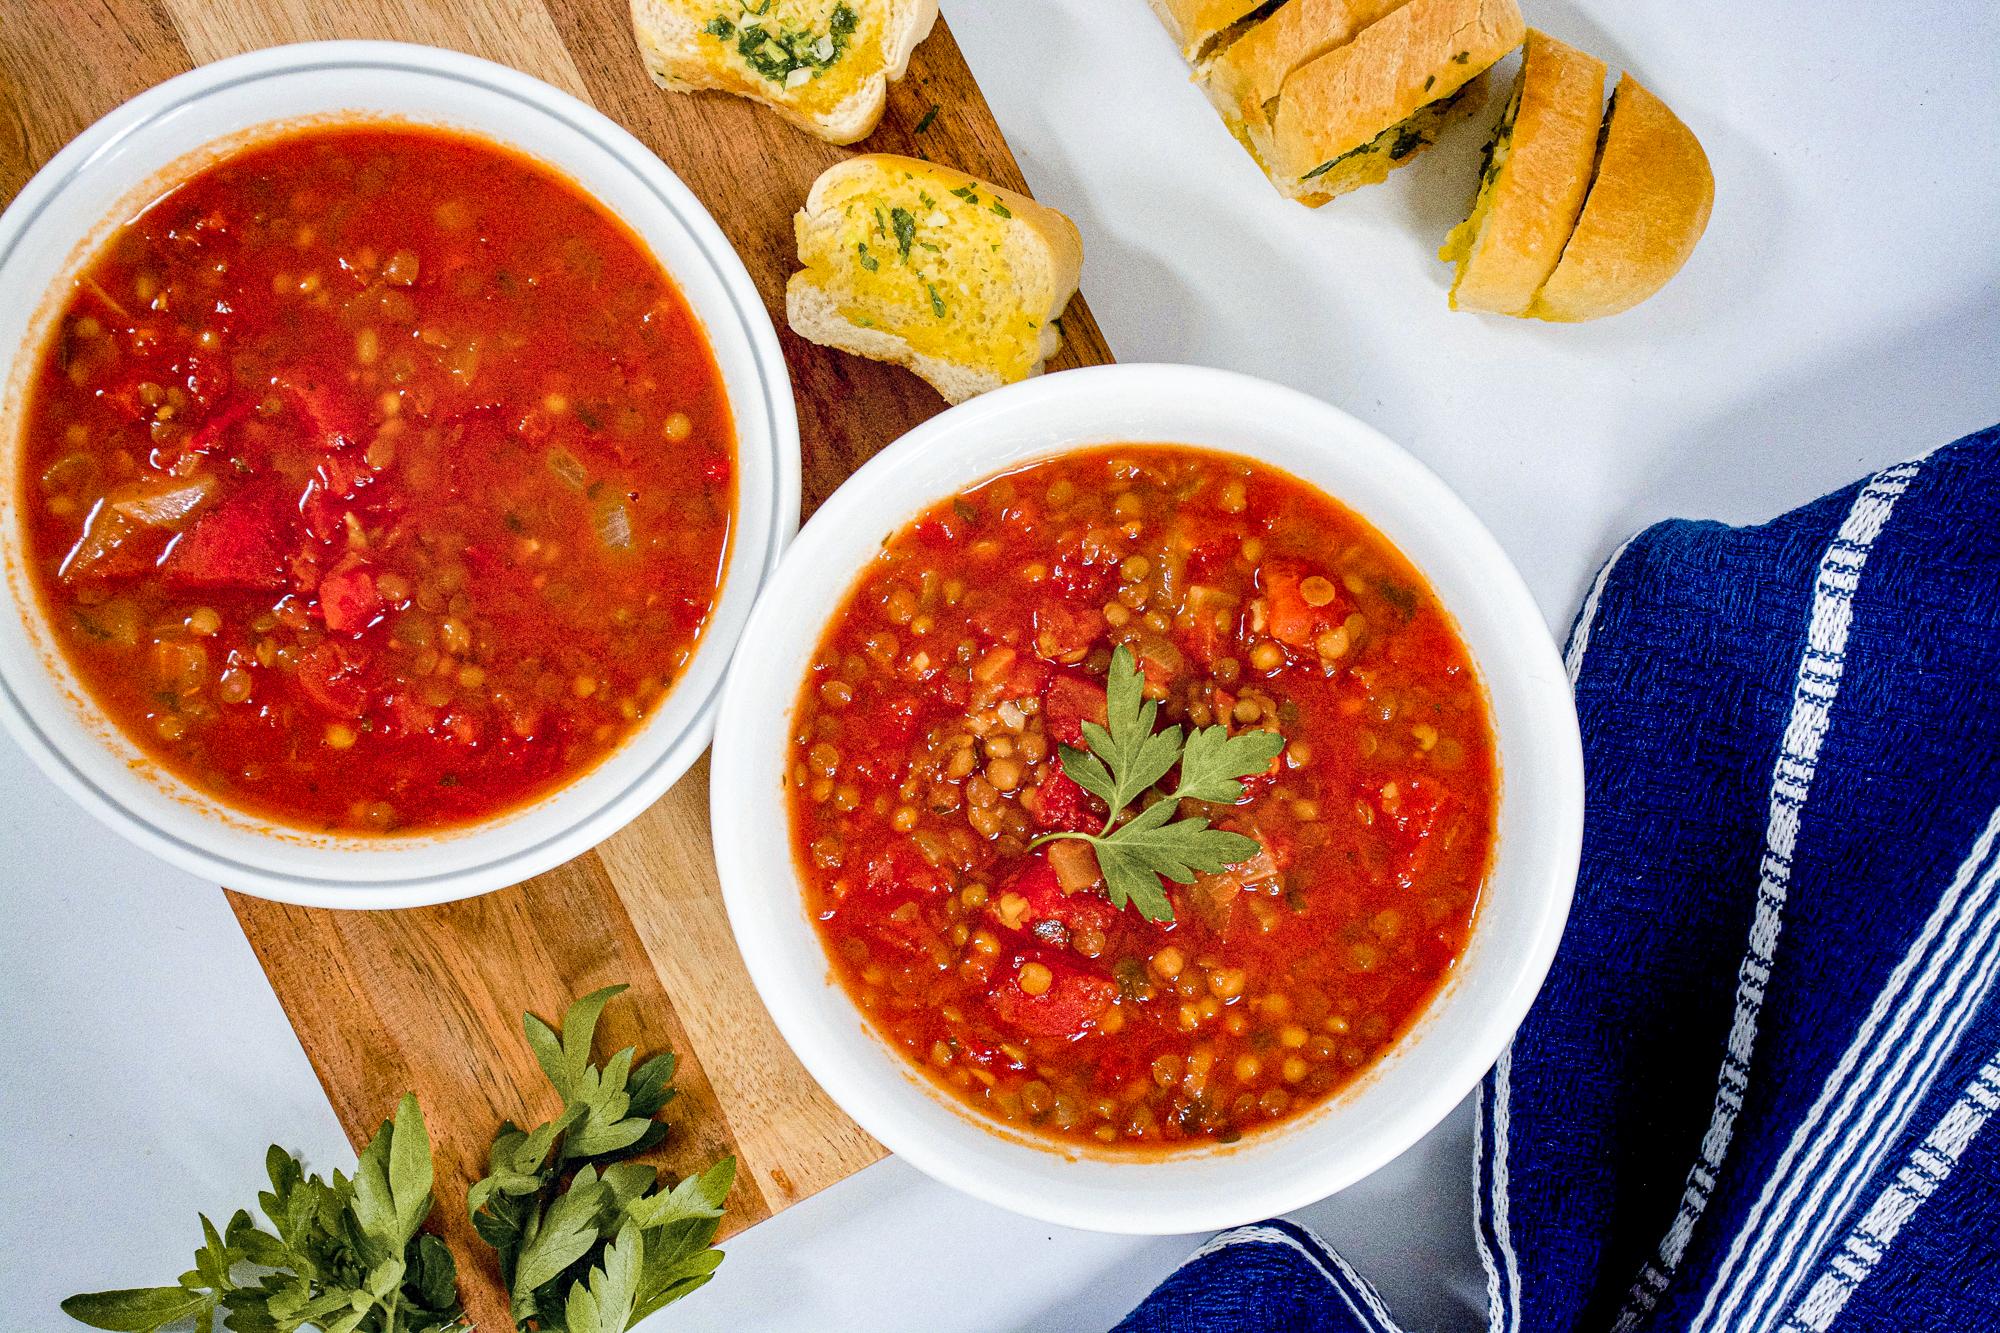 Tomato & Lentil Soup with Garlic Bread